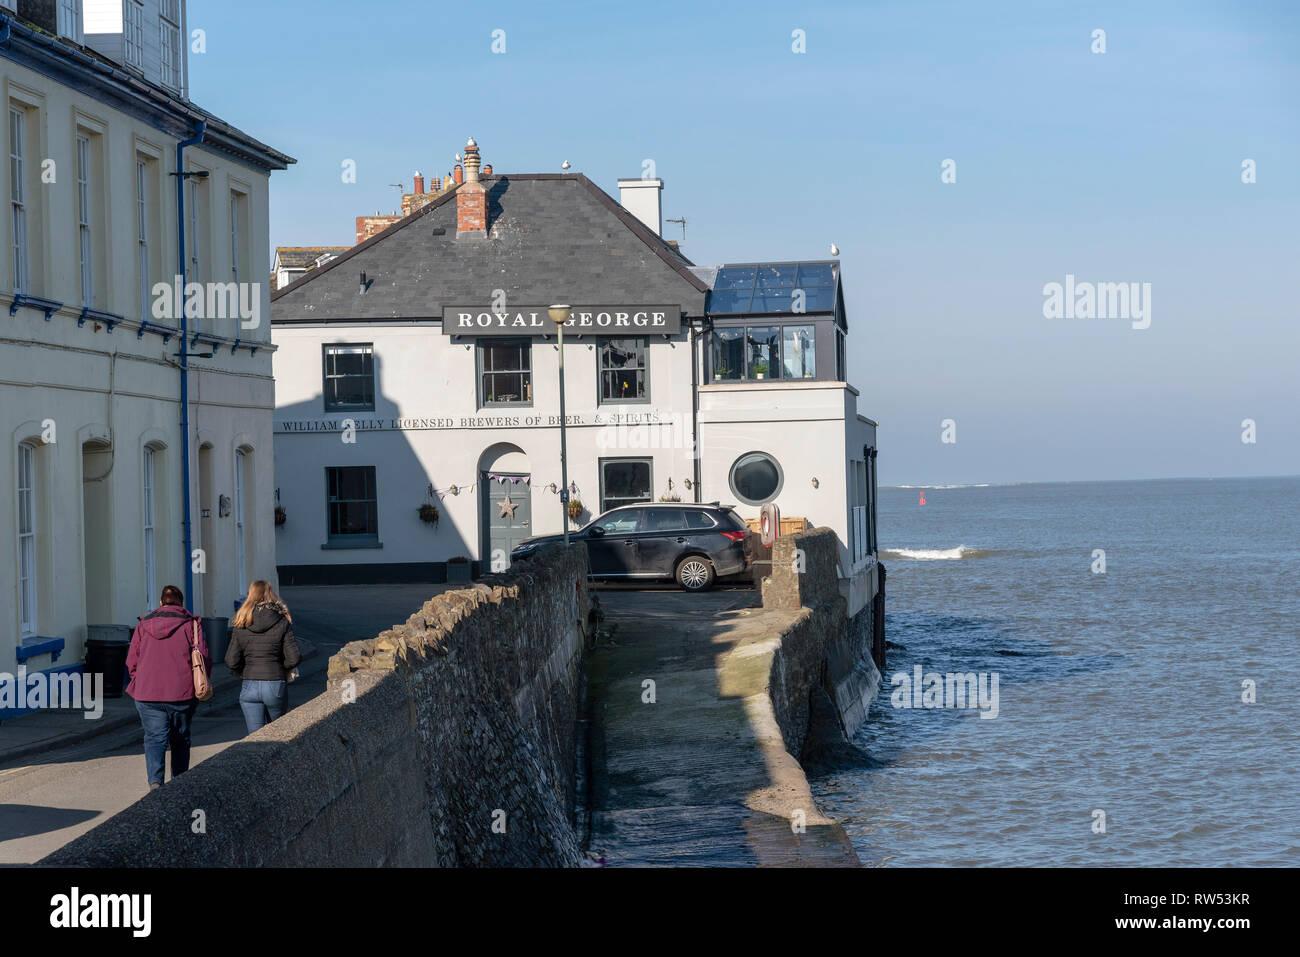 Appledore, North Devon, England, UK. February 2019. The Royal George a waterfront coastal pub. - Stock Image